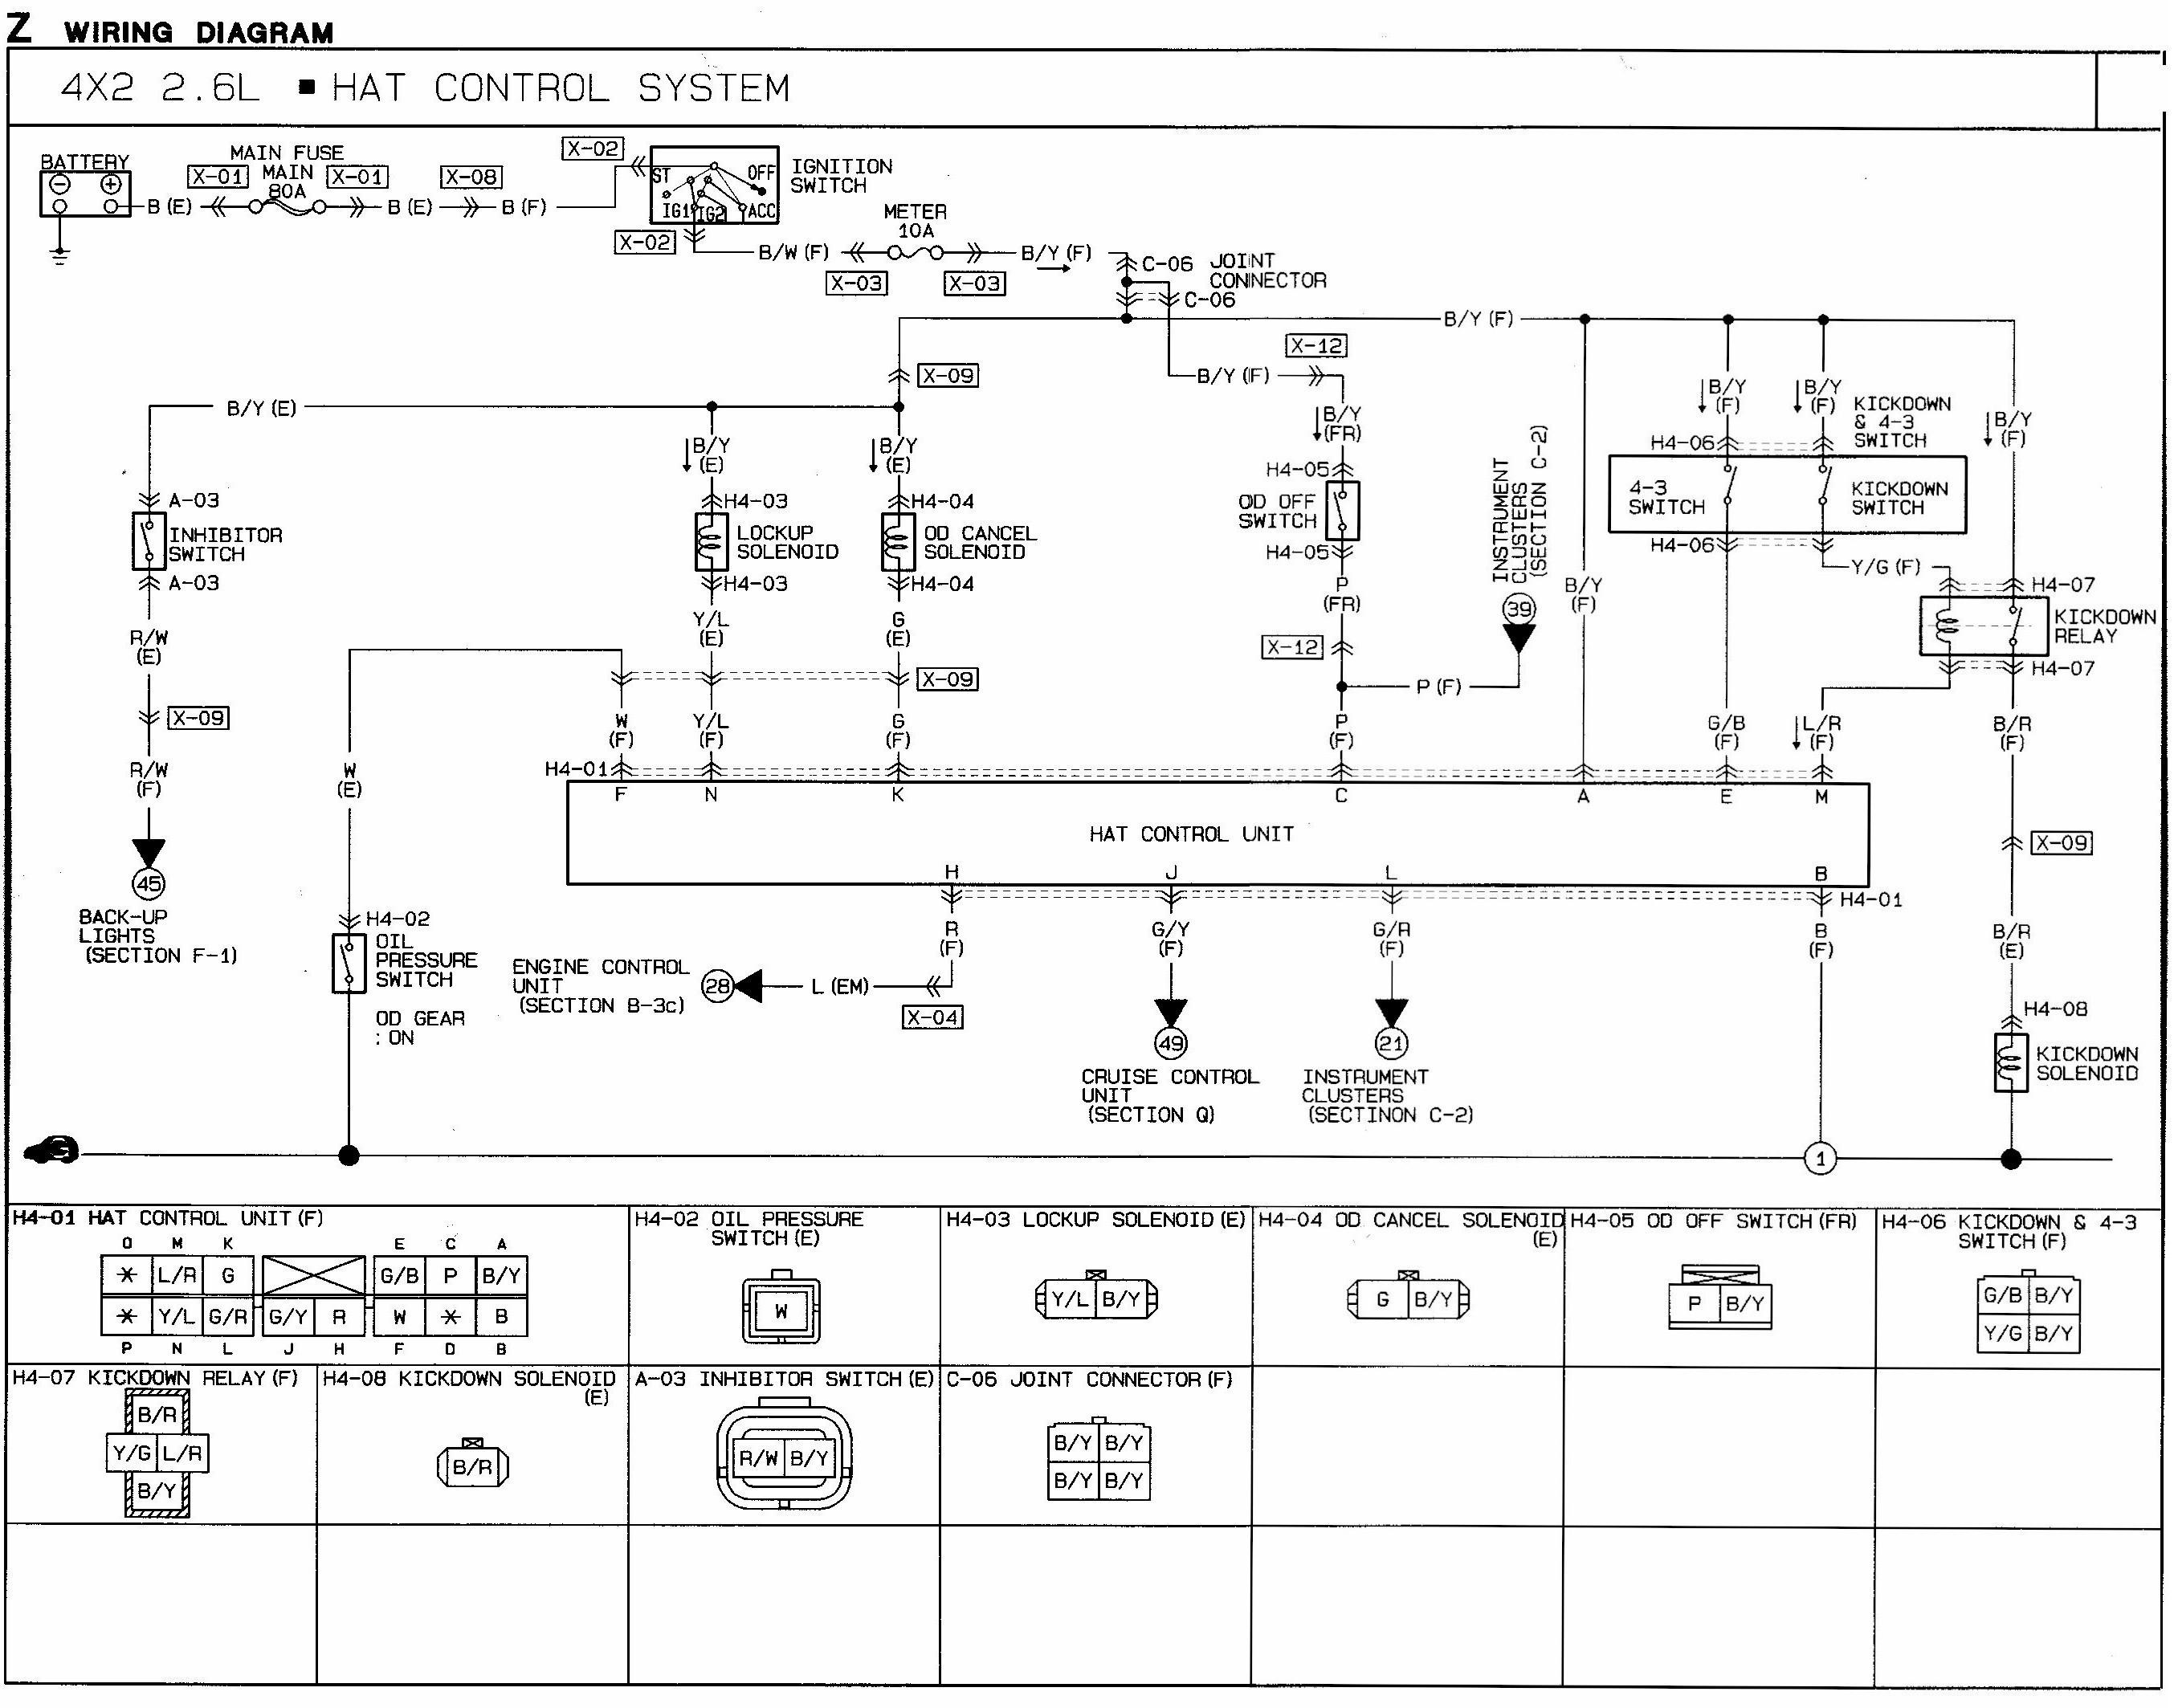 Air Brake Valve Diagram Haldex Abs Wiring Diagram Experts Wiring Diagram • Of Air Brake Valve Diagram